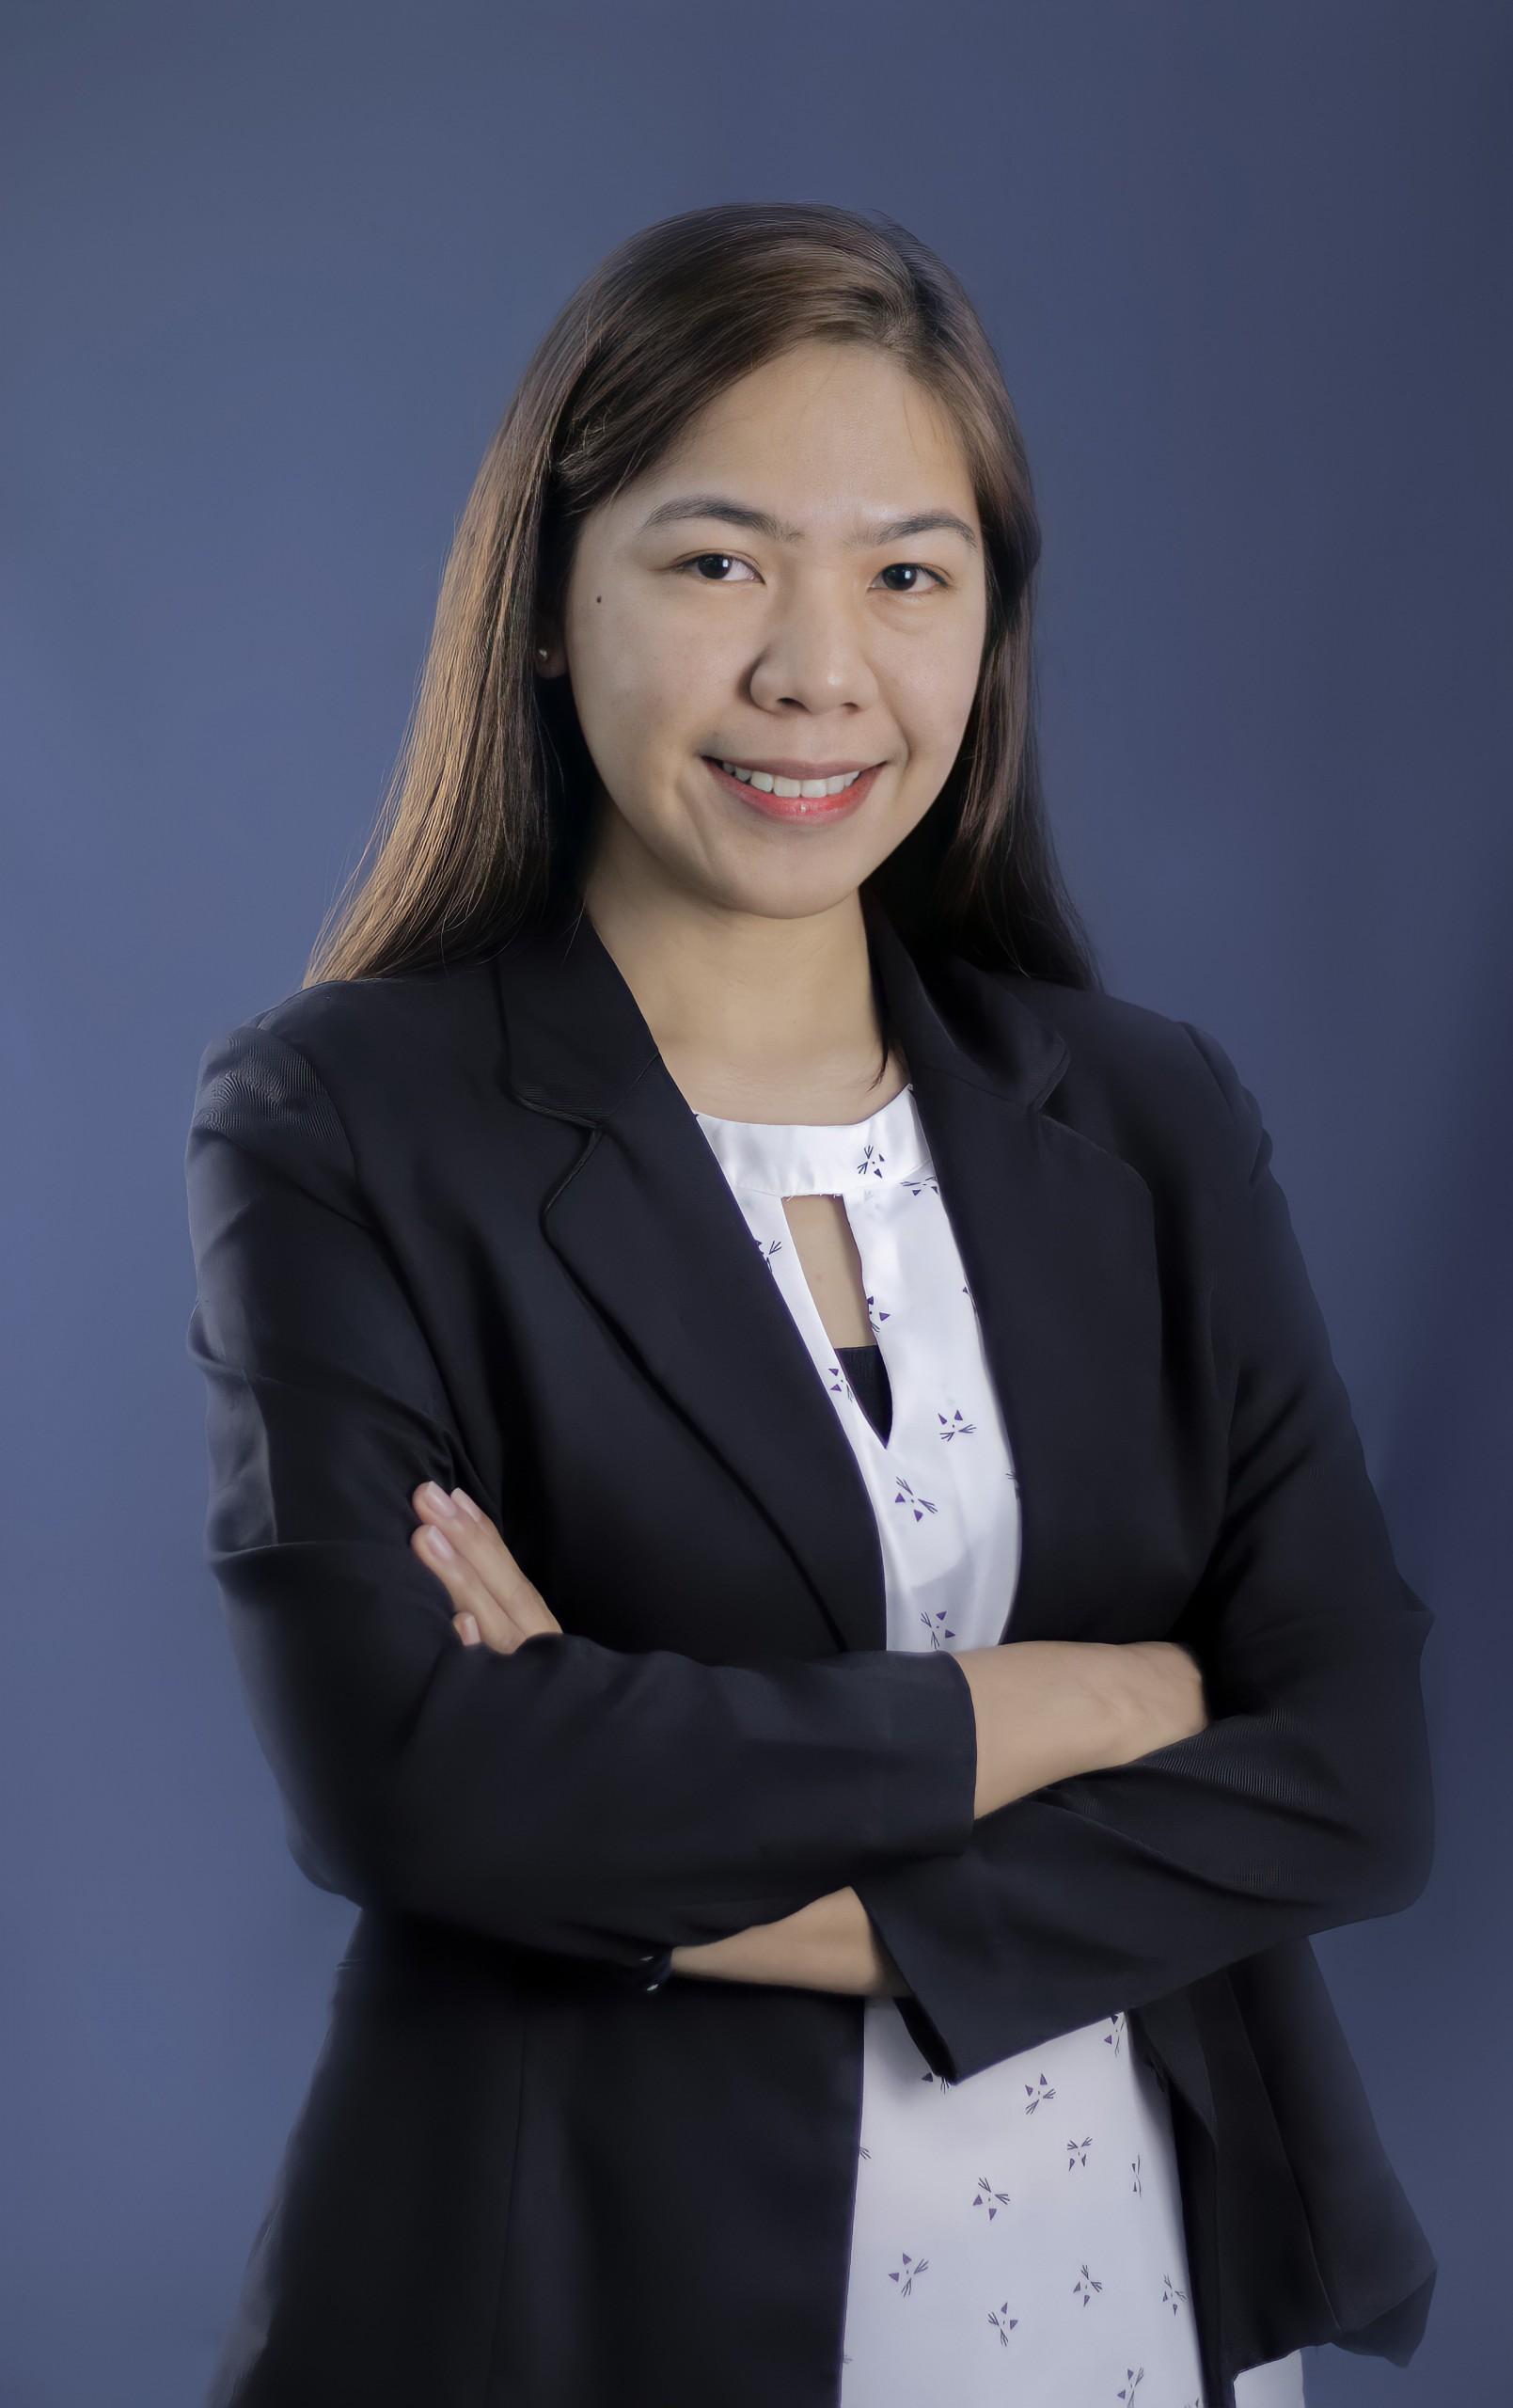 Ana Marie Sumalde